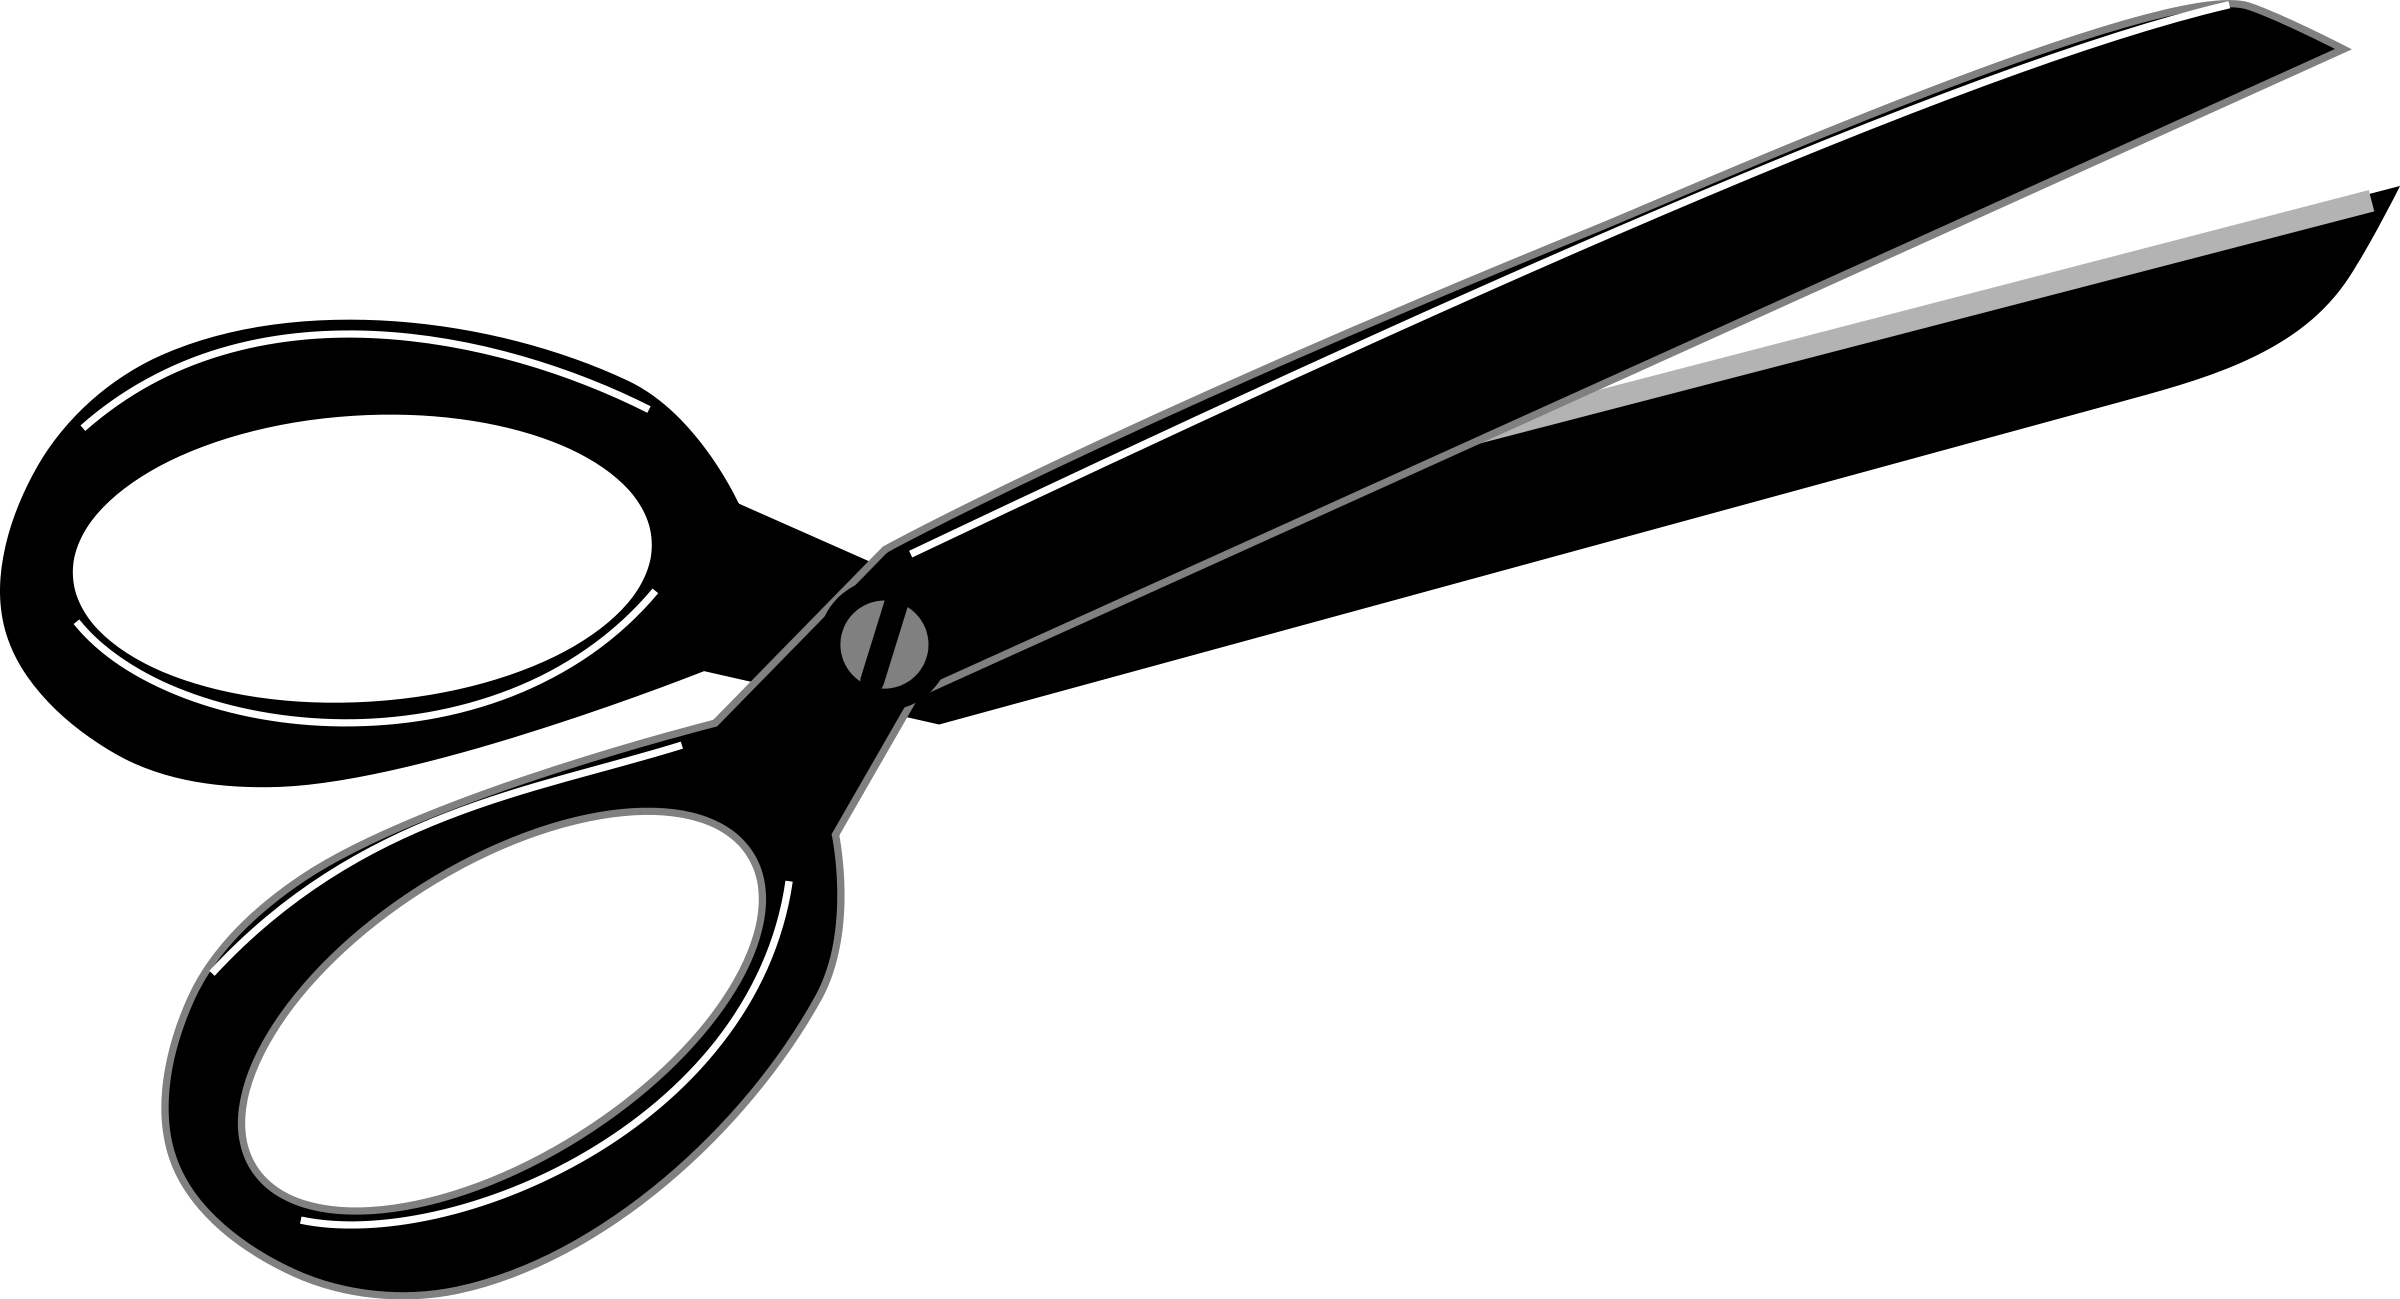 2400x1299 Scissors Png Image Png Mart